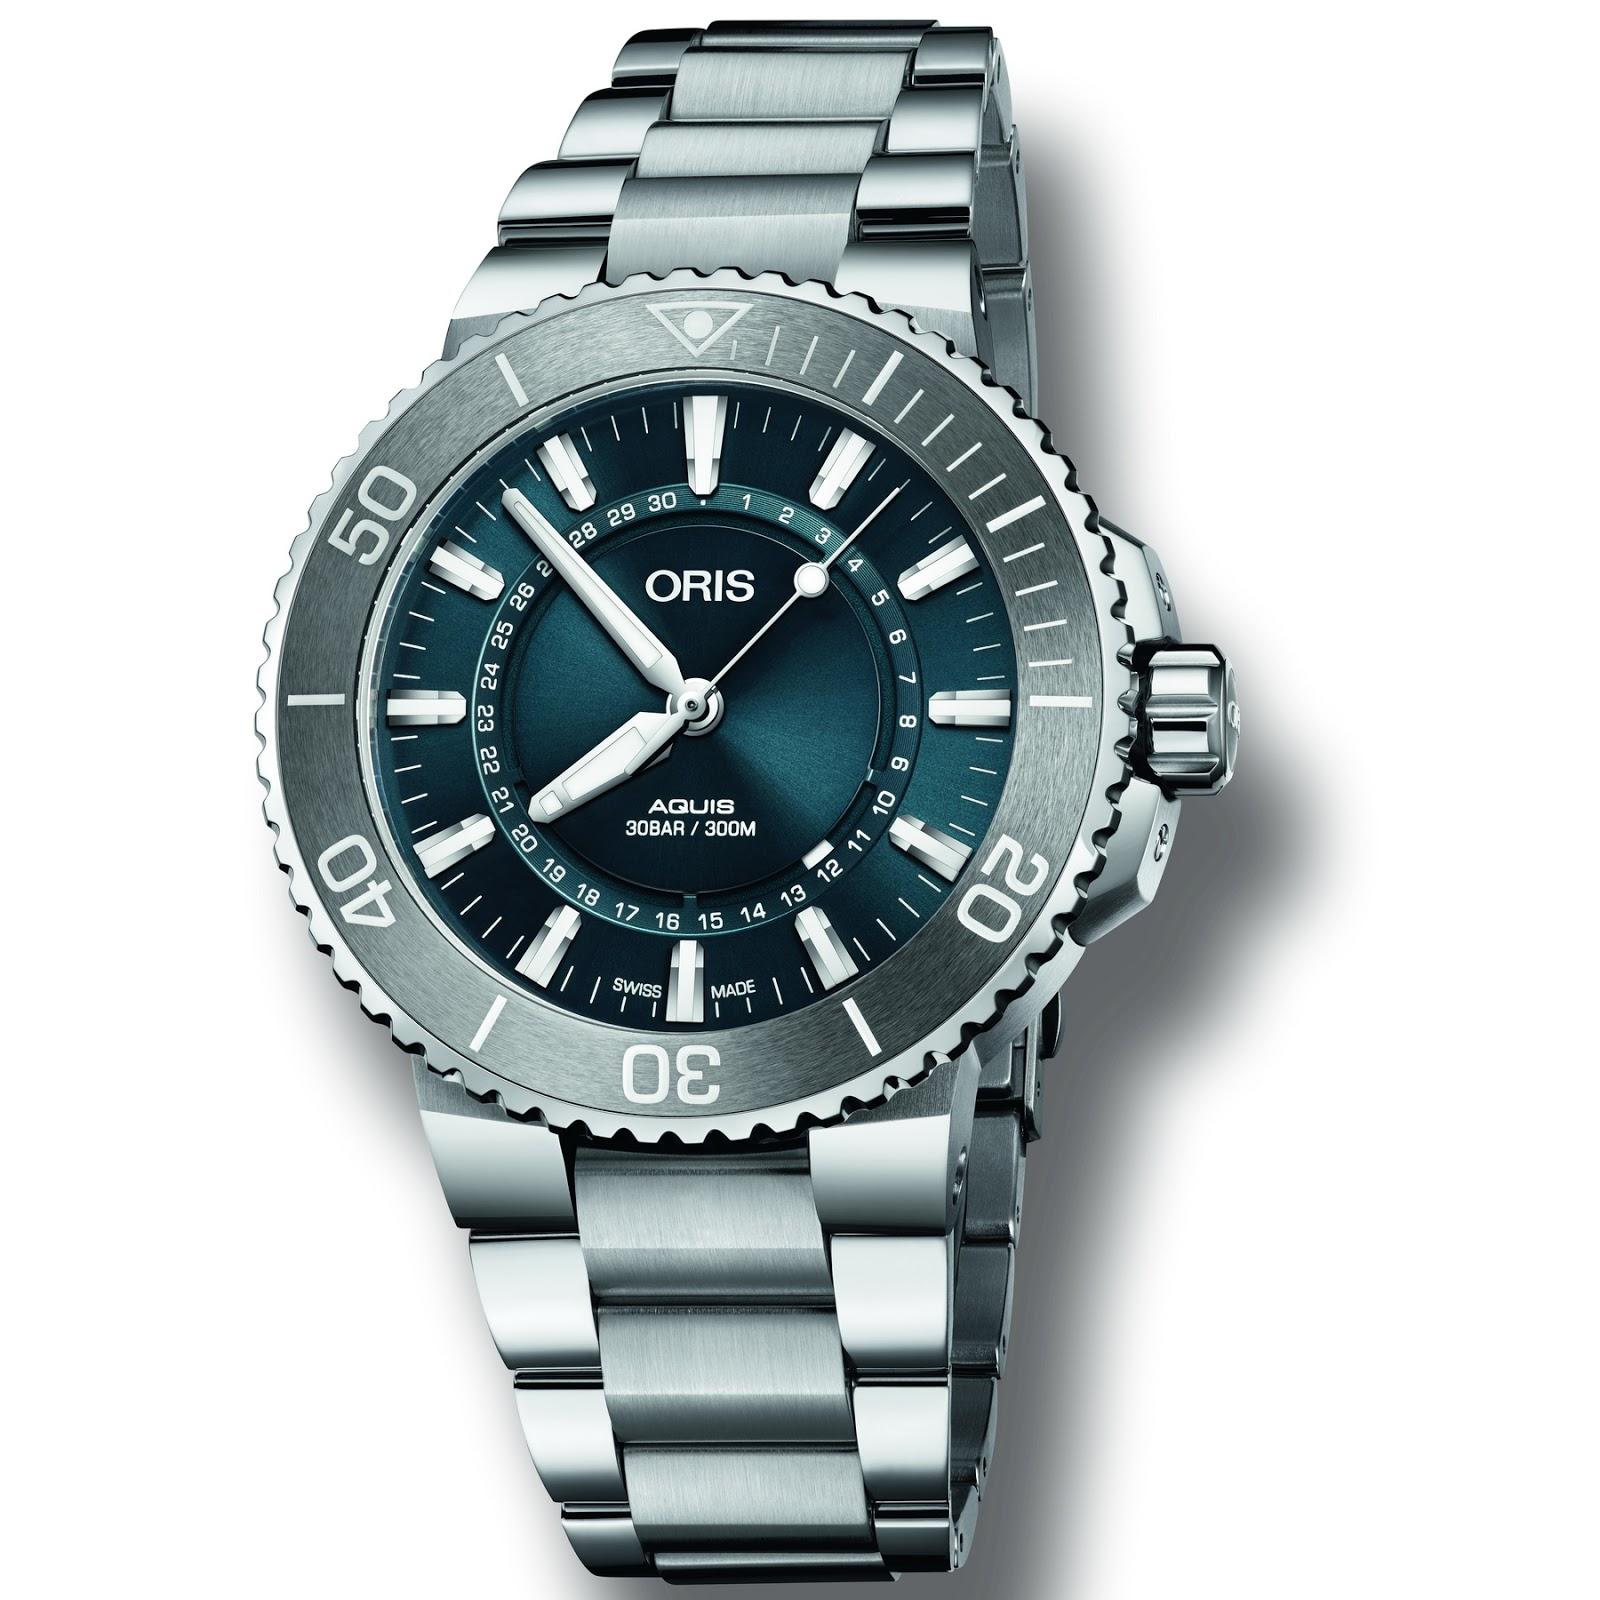 OceanicTime - ORIS Aquis Source of Life Ltd EDITION 301d436be7